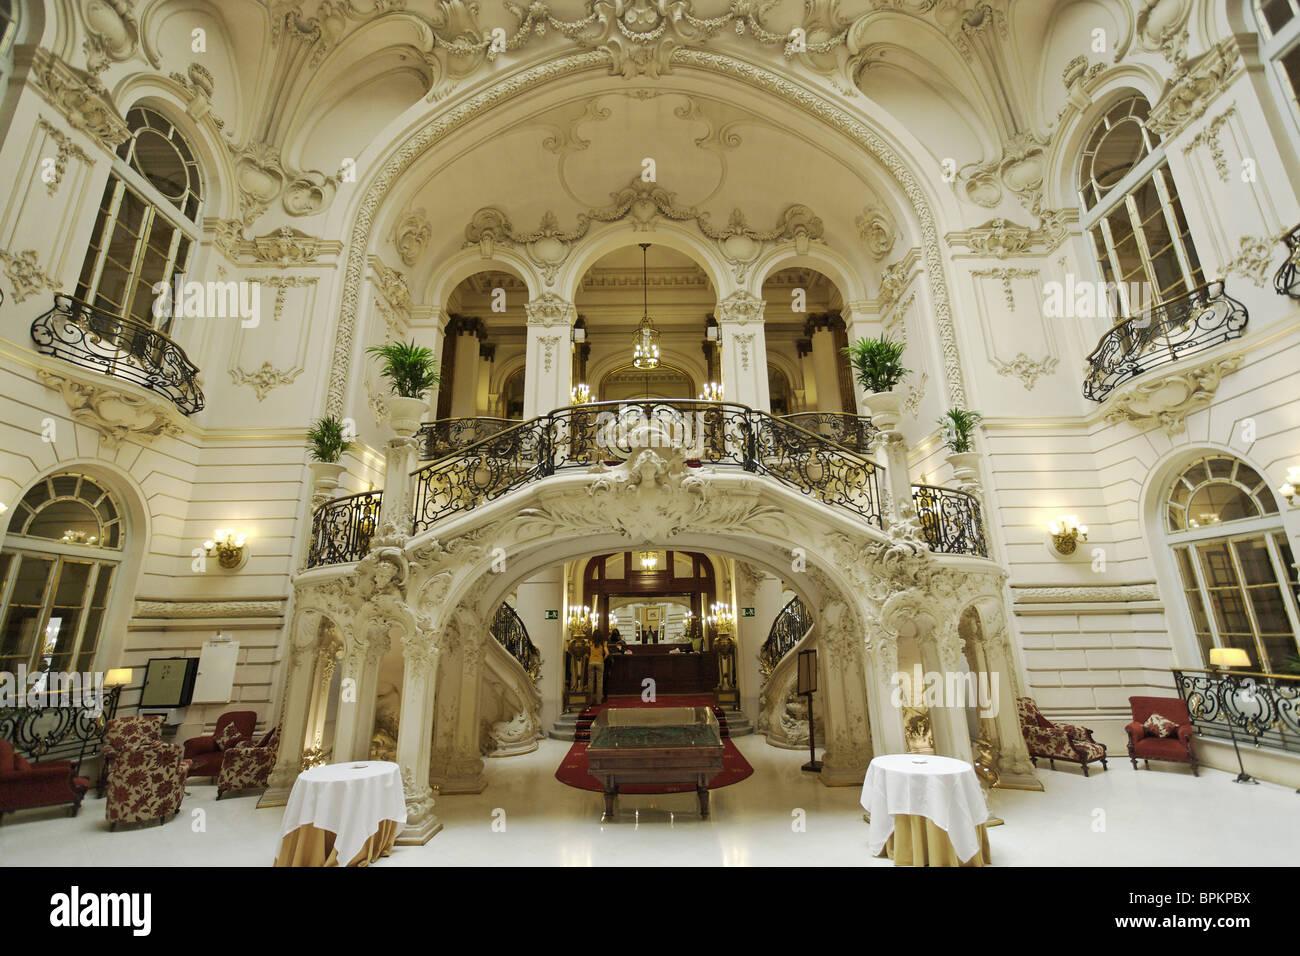 Inside the Casino, Madrid, Spain - Stock Image